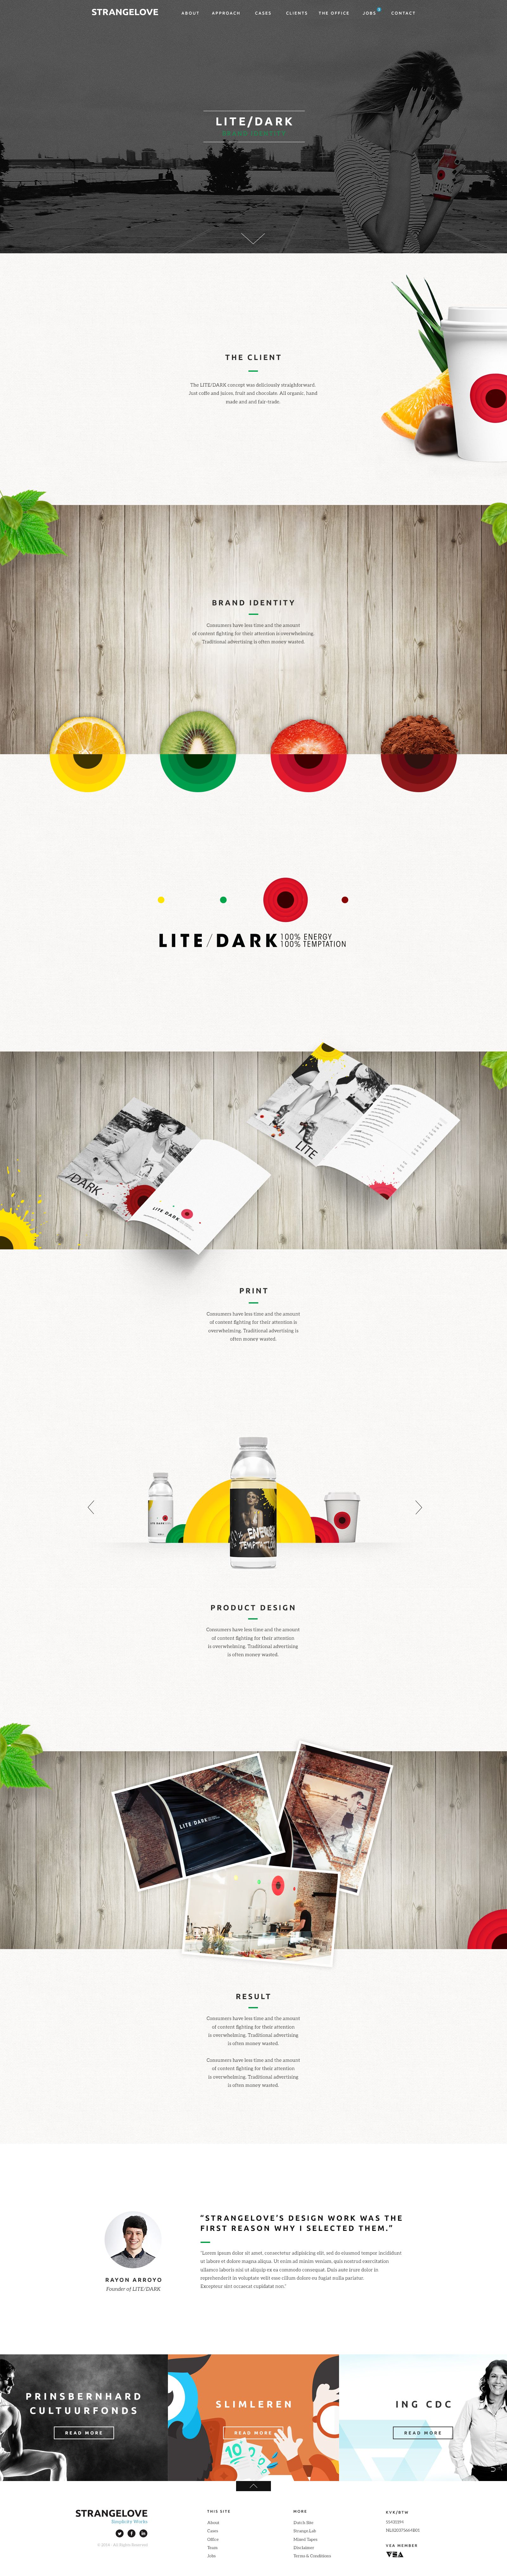 Dribbble Subpage Litedark 2 Jpg By Tim Dekens Unique Web Design Web Development Design Interactive Design